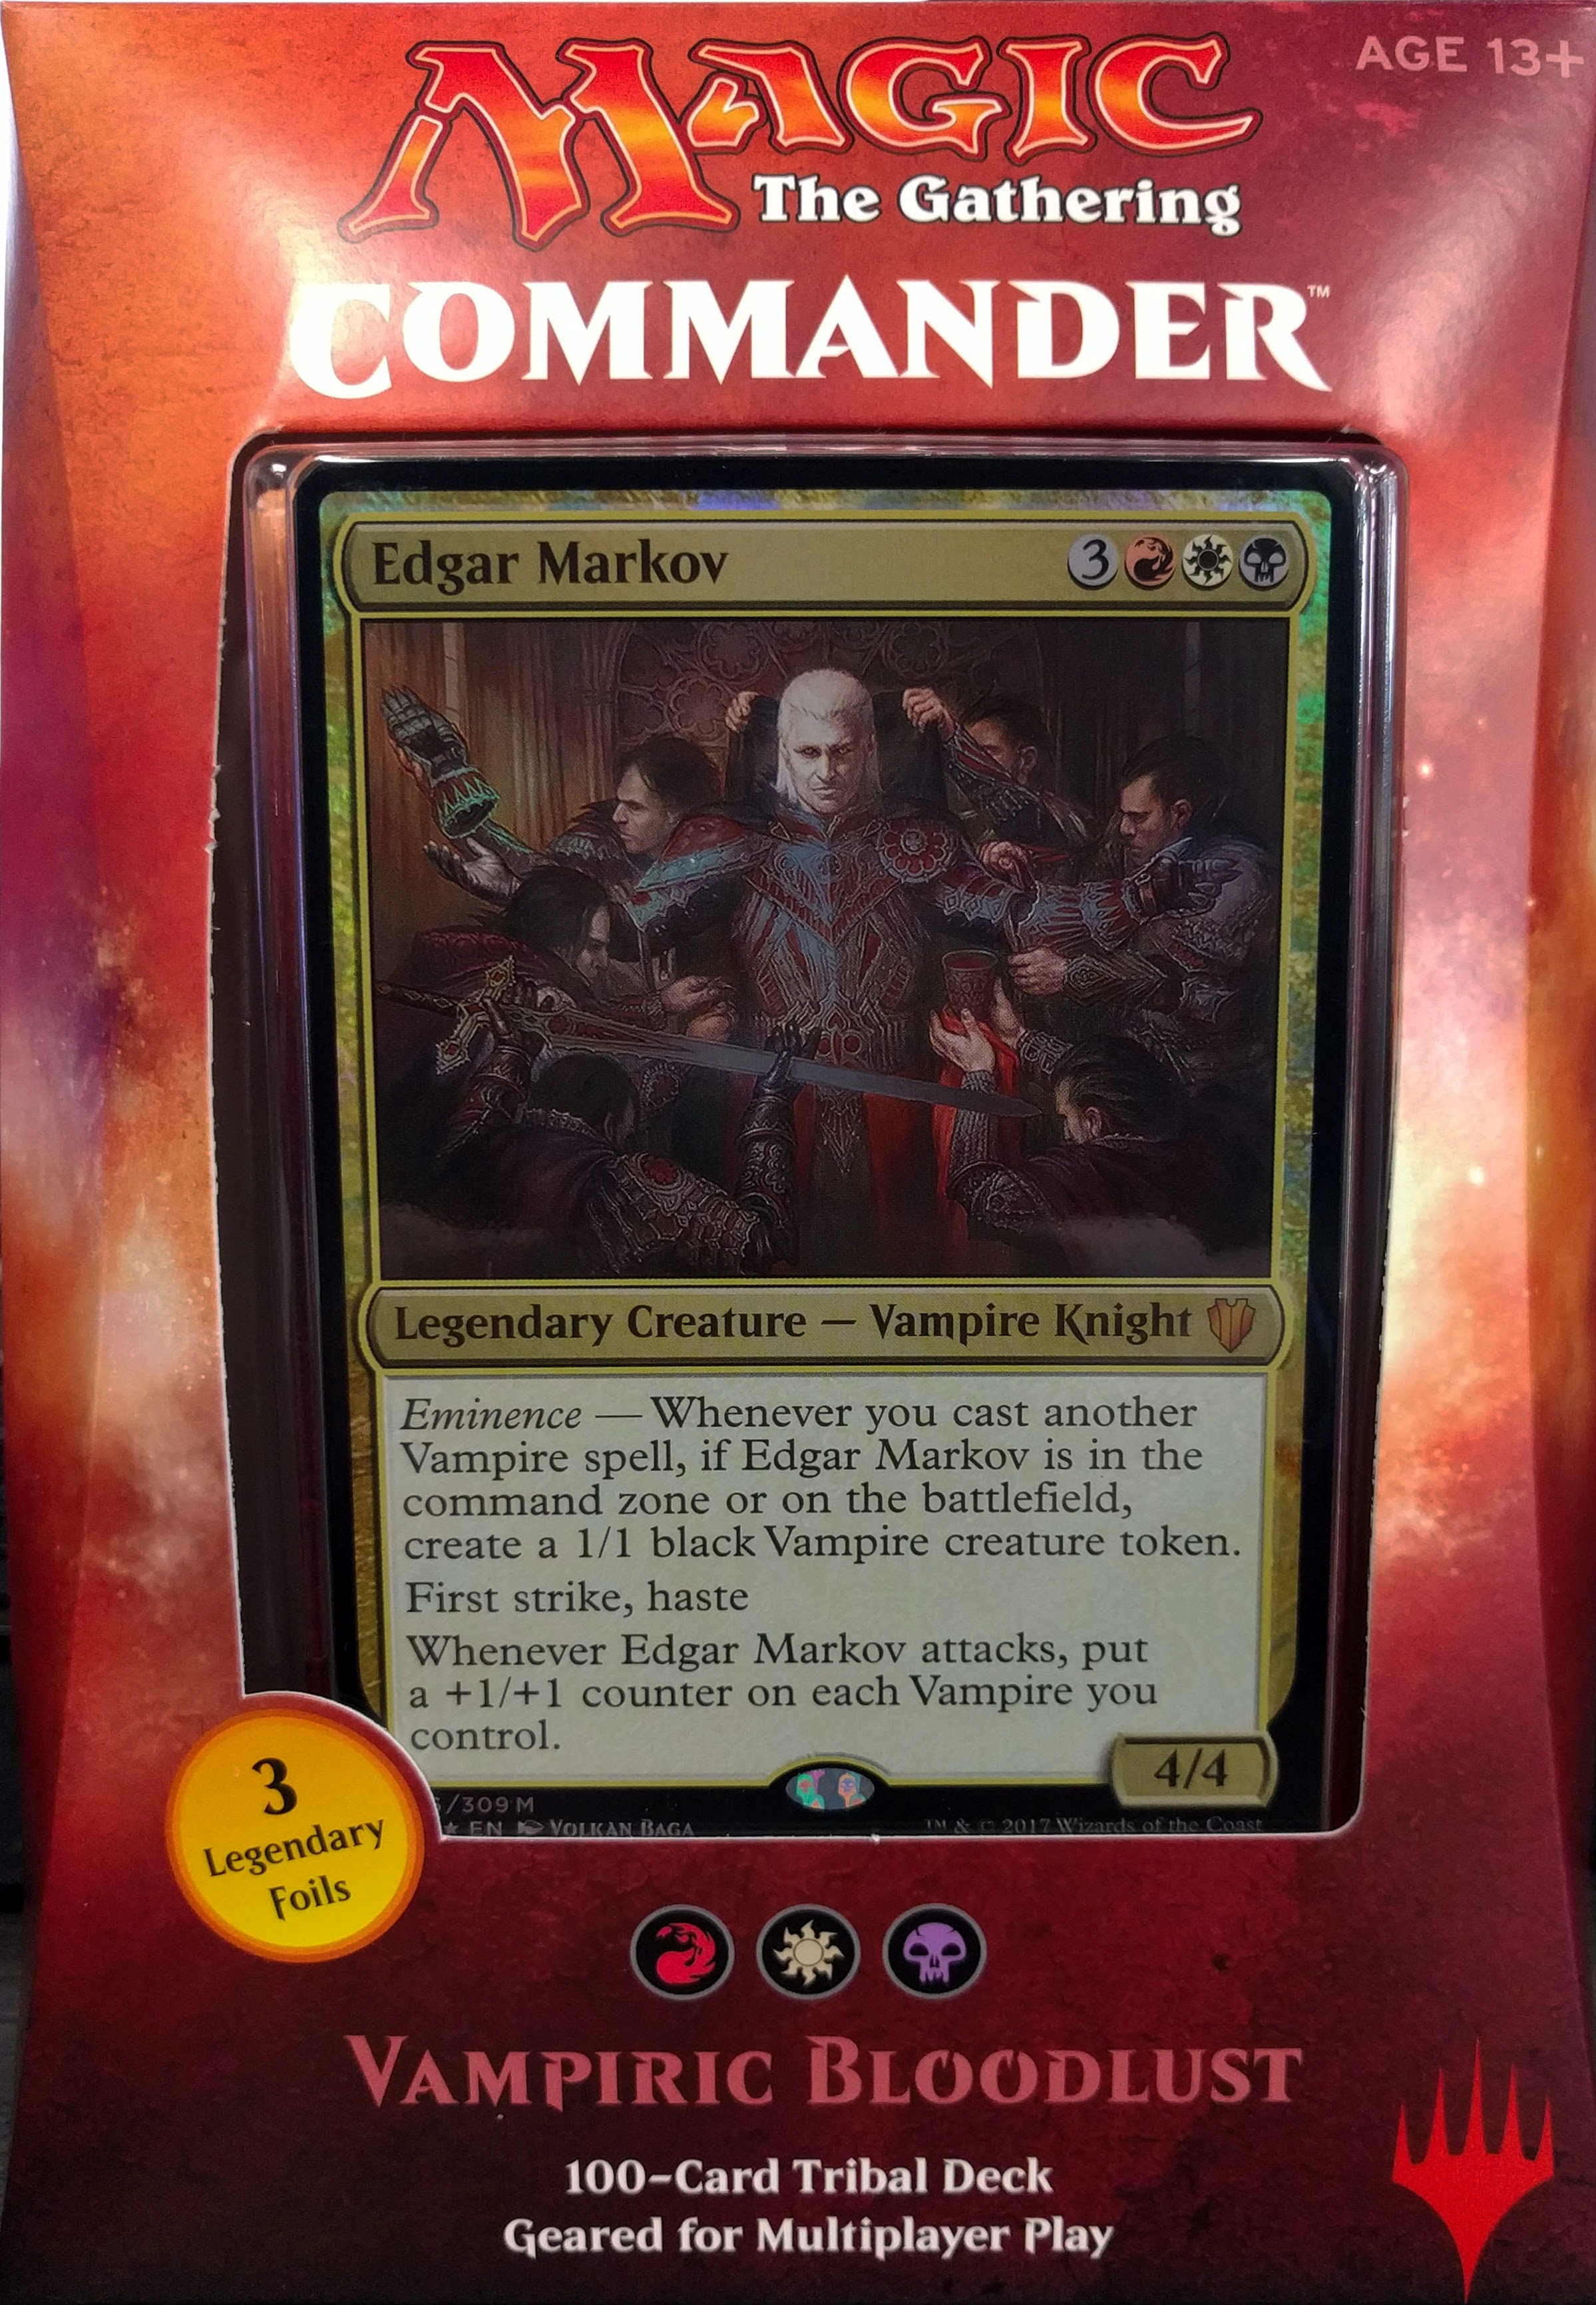 Magic: The Gathering 2017 Commander Deck - Vampiric Bloodlust - Walmart.com